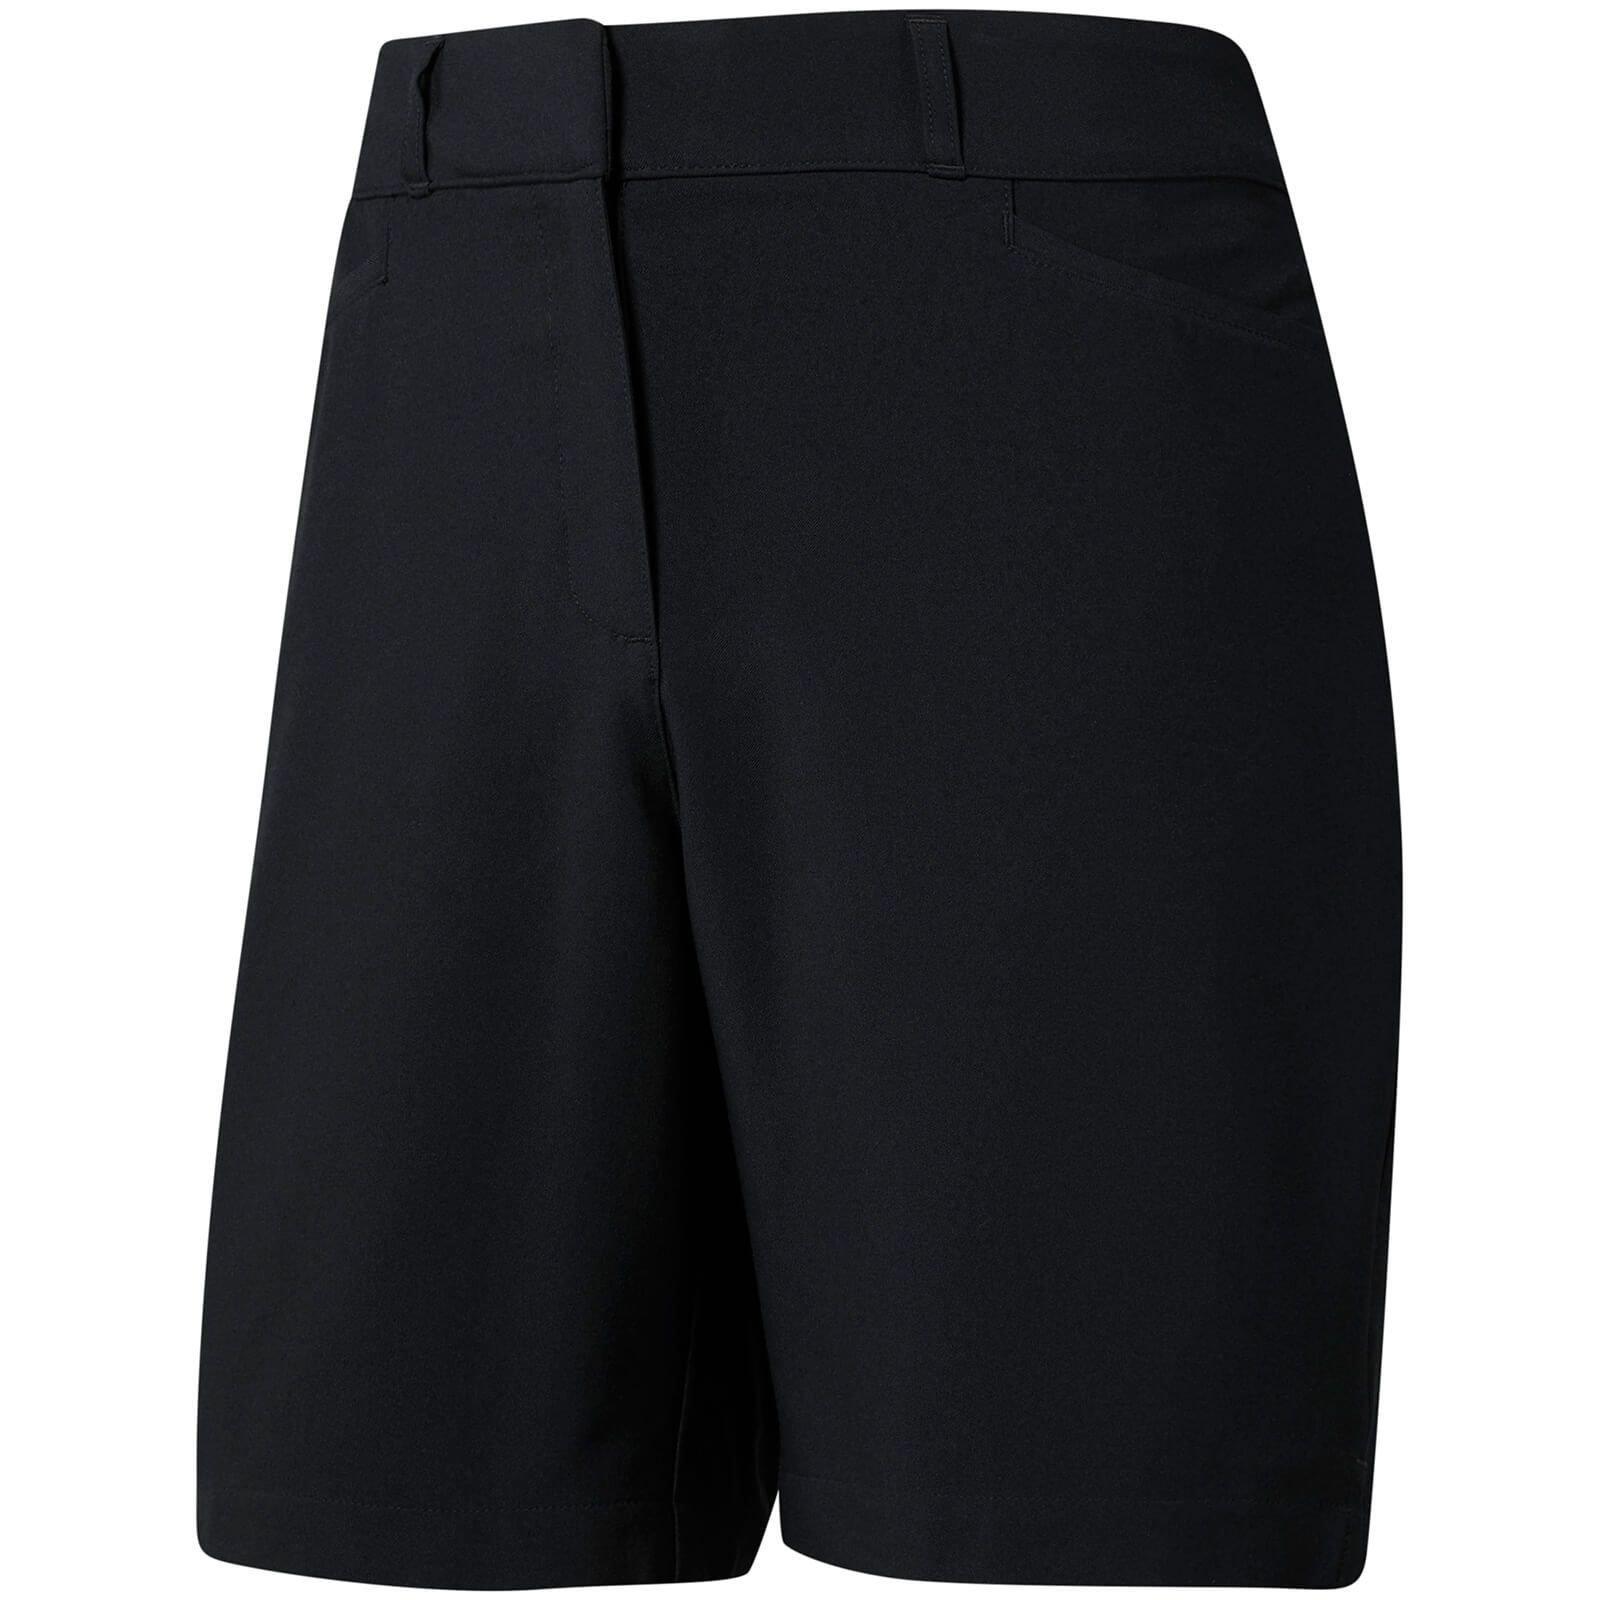 Validación soborno carrera  Adidas Womens Ultimate Club 7-Inch Golf Shorts 2020 - Carl's Golfland